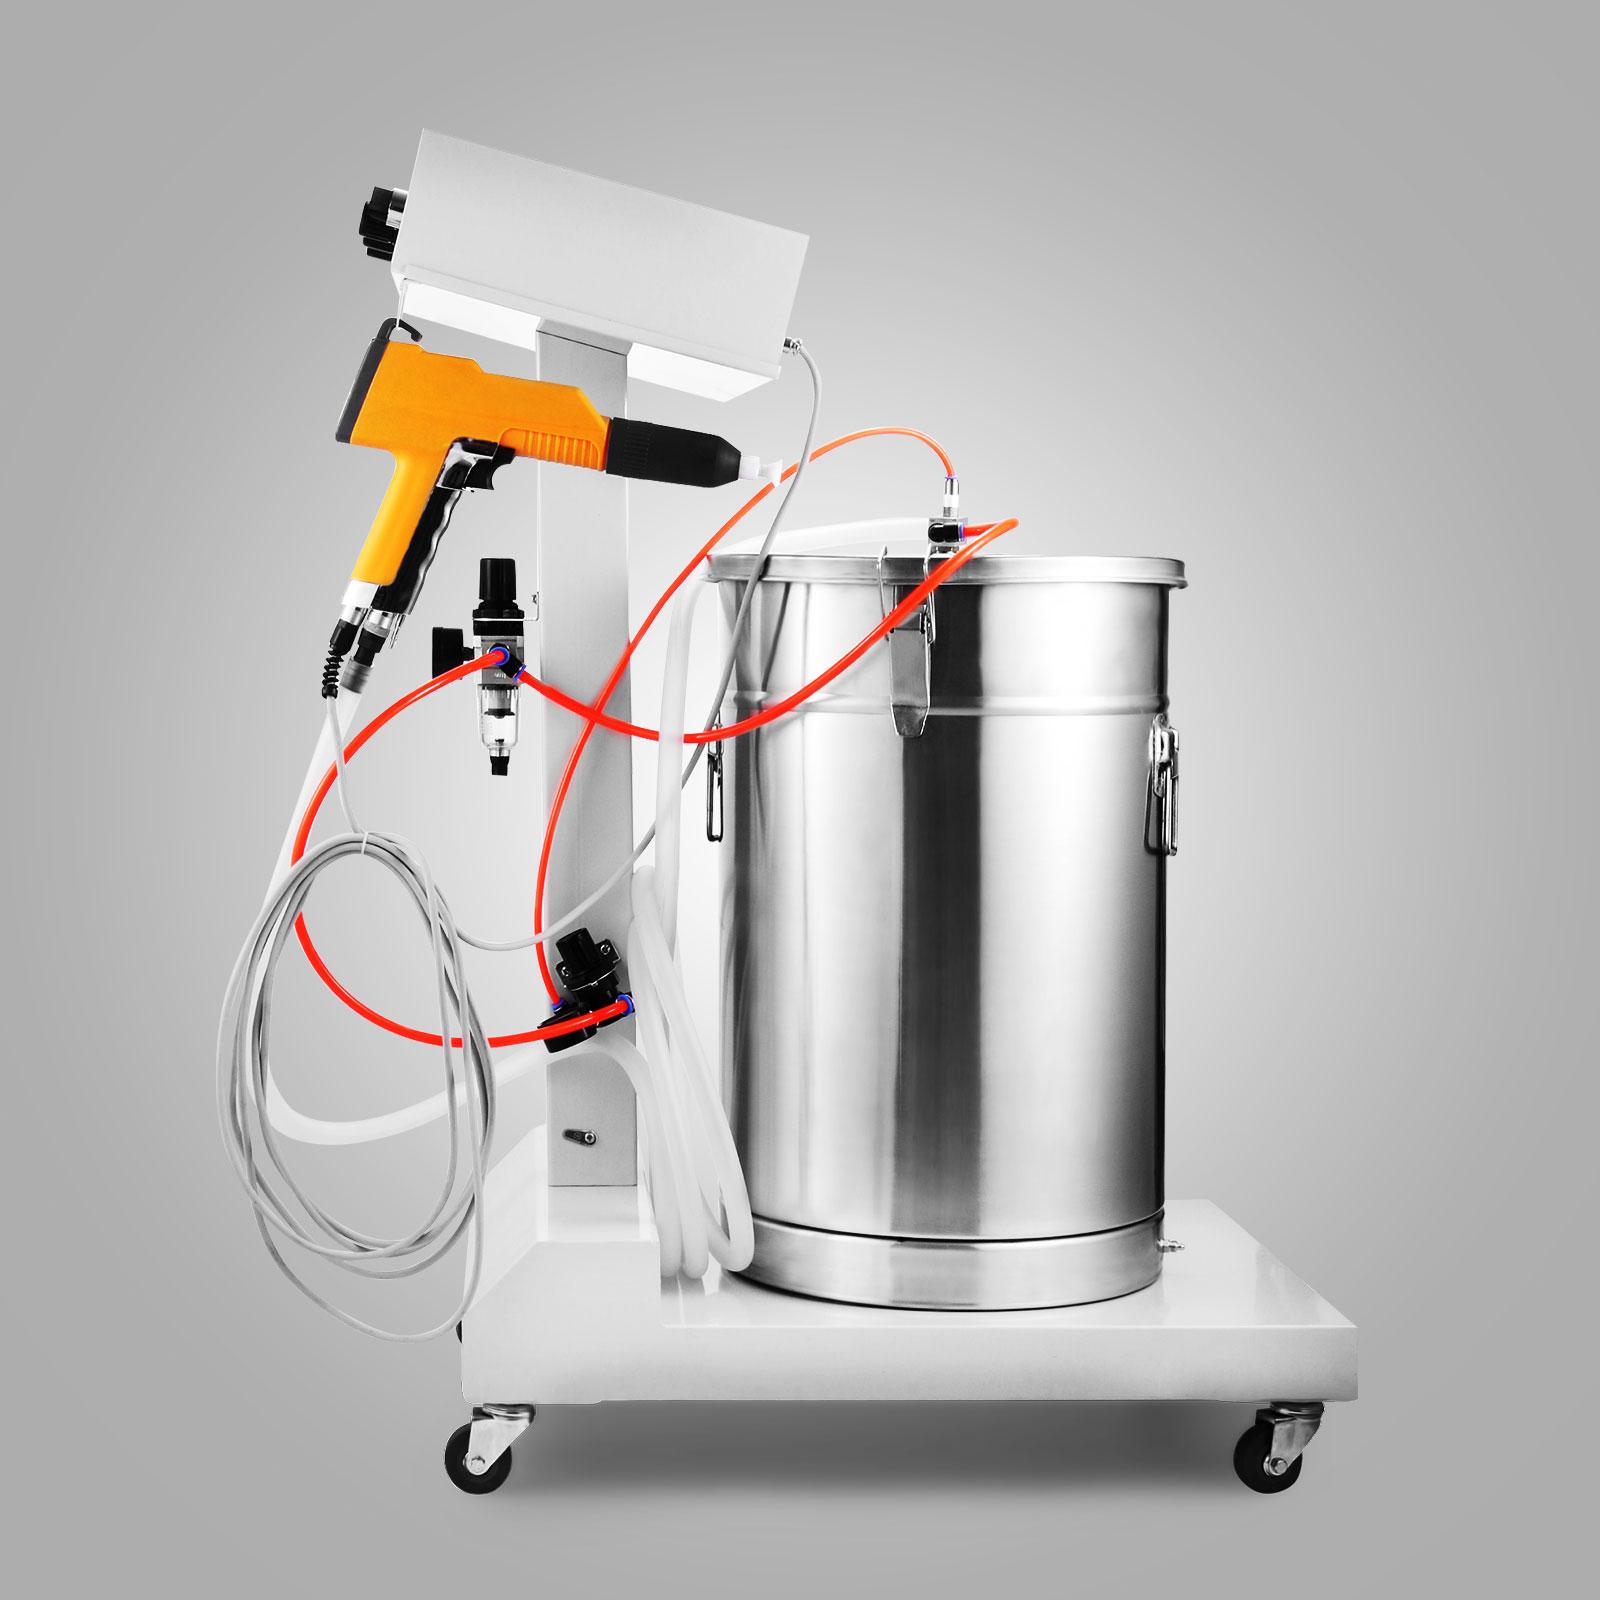 electrostatic powder coating machine wy 101 duster paint On electrostatic paint sprayer